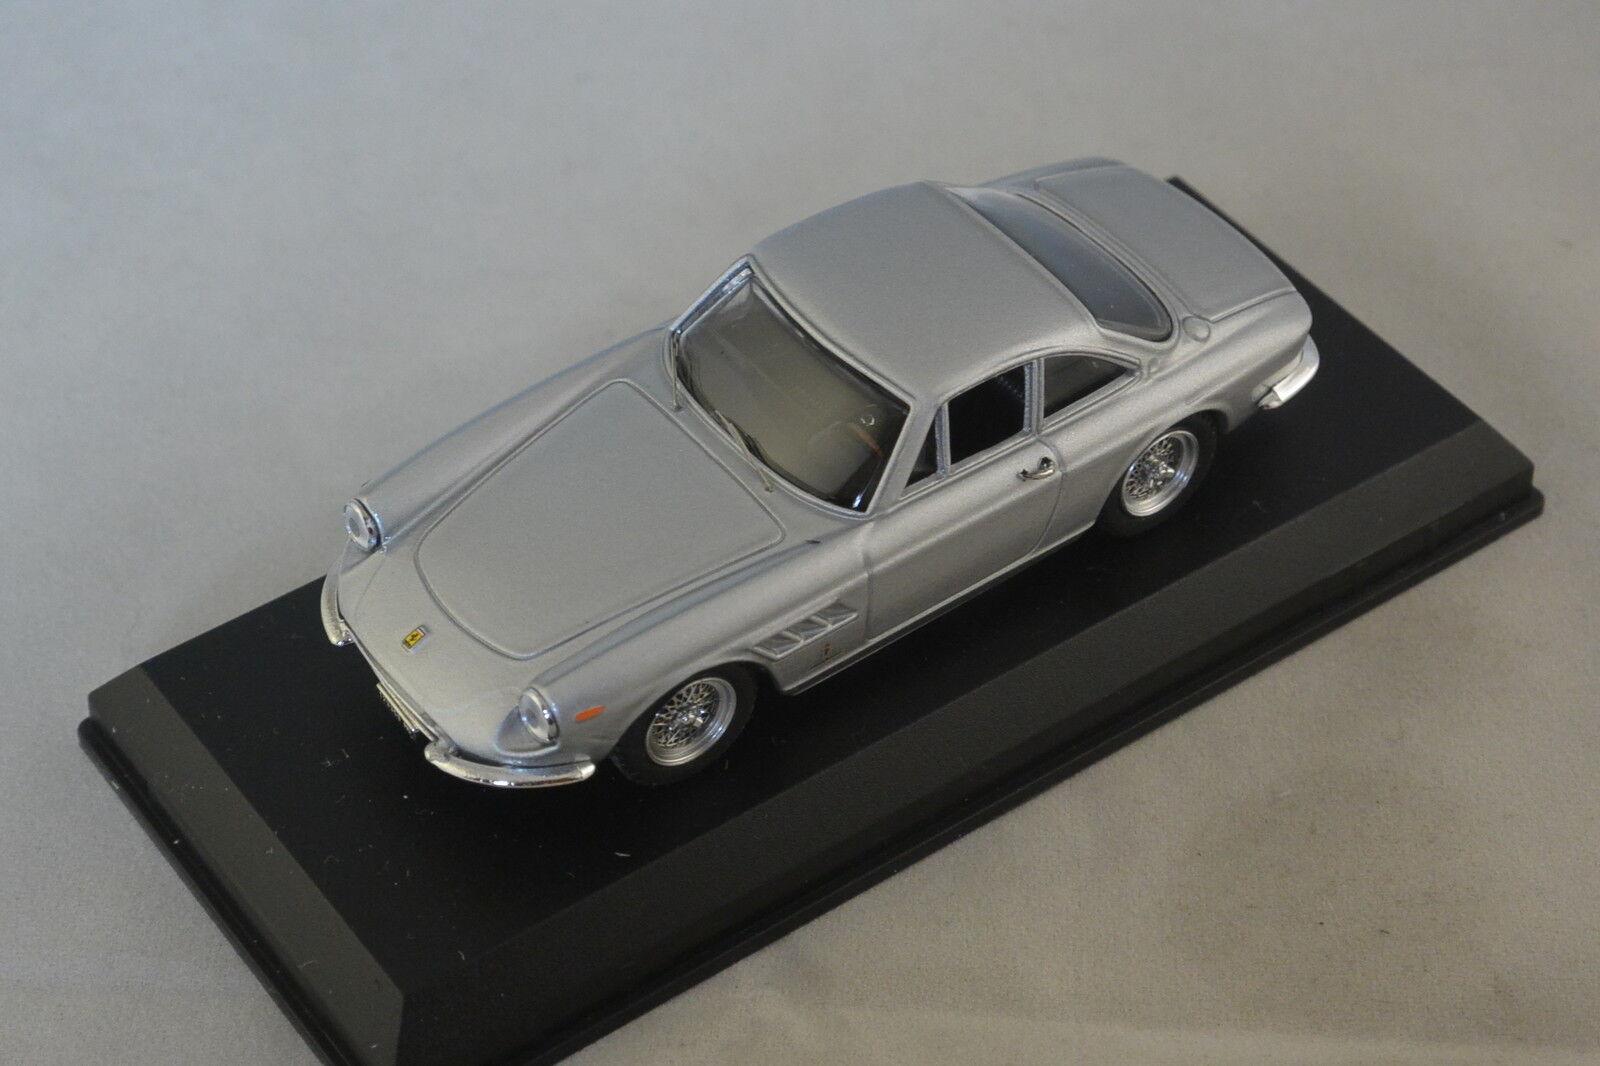 MODEL BEST 9146 - FERRARI 330 GT COMMENTORE ARGENT 1966 1 43